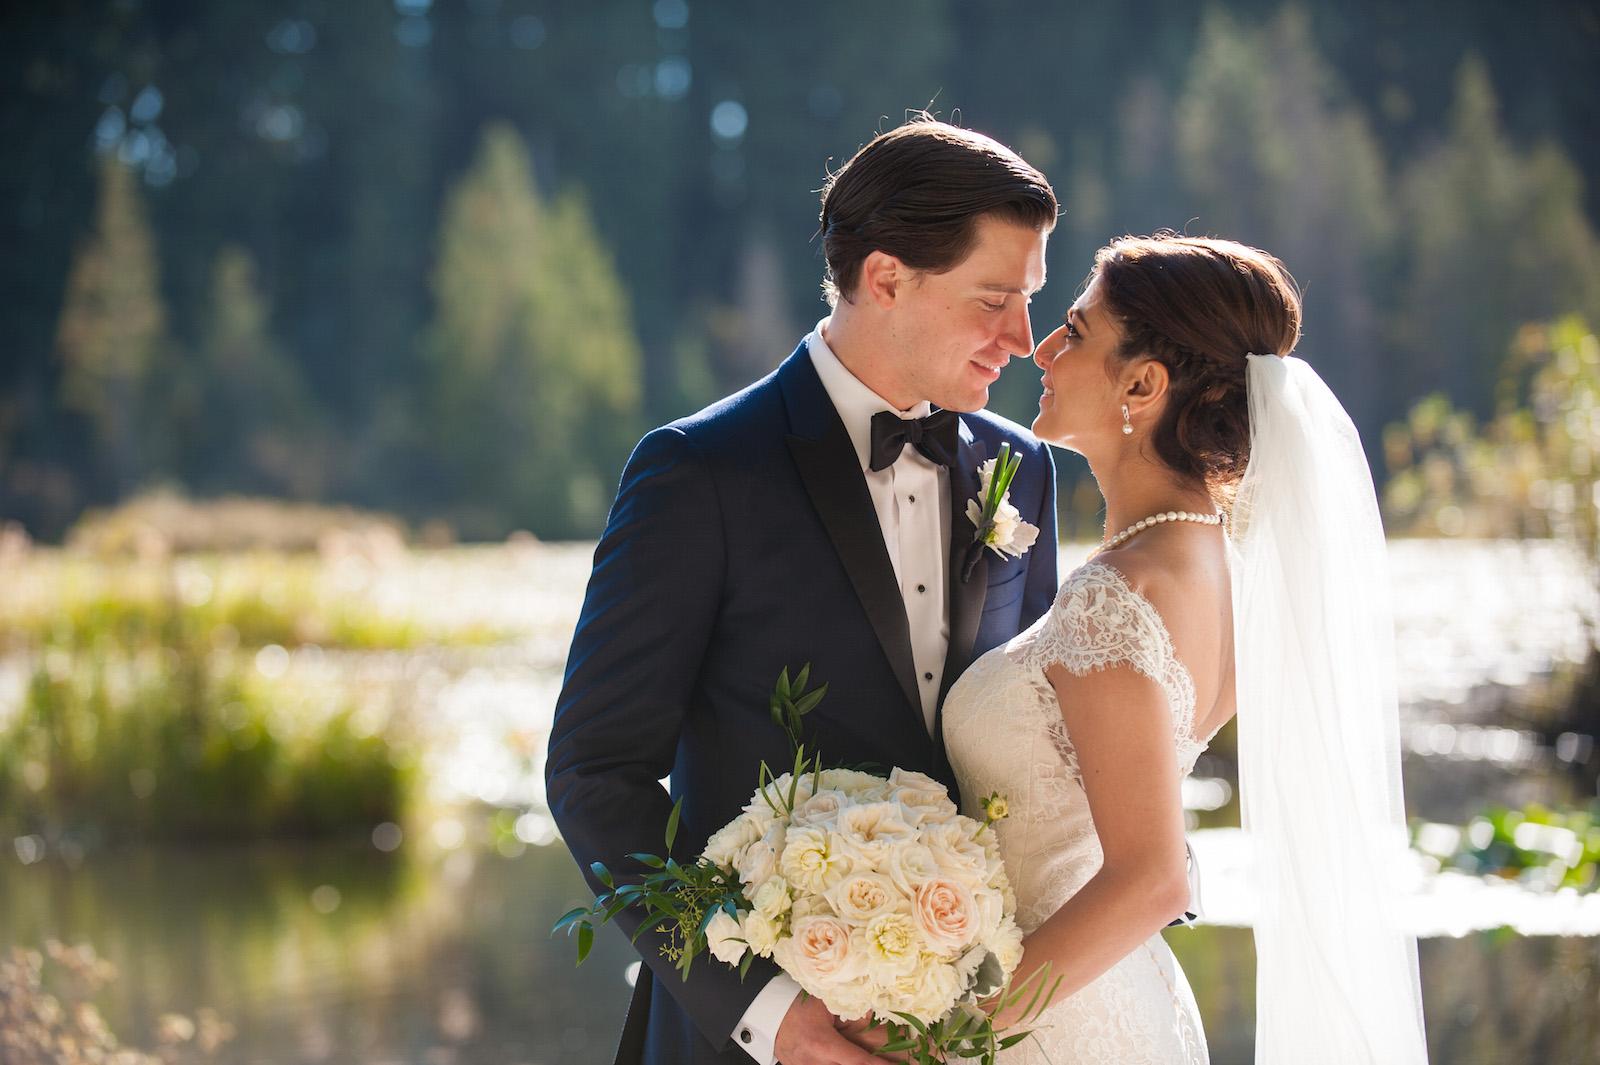 victoria-wedding-photographers-fairmont-pacific-rim-wedding-31.jpg